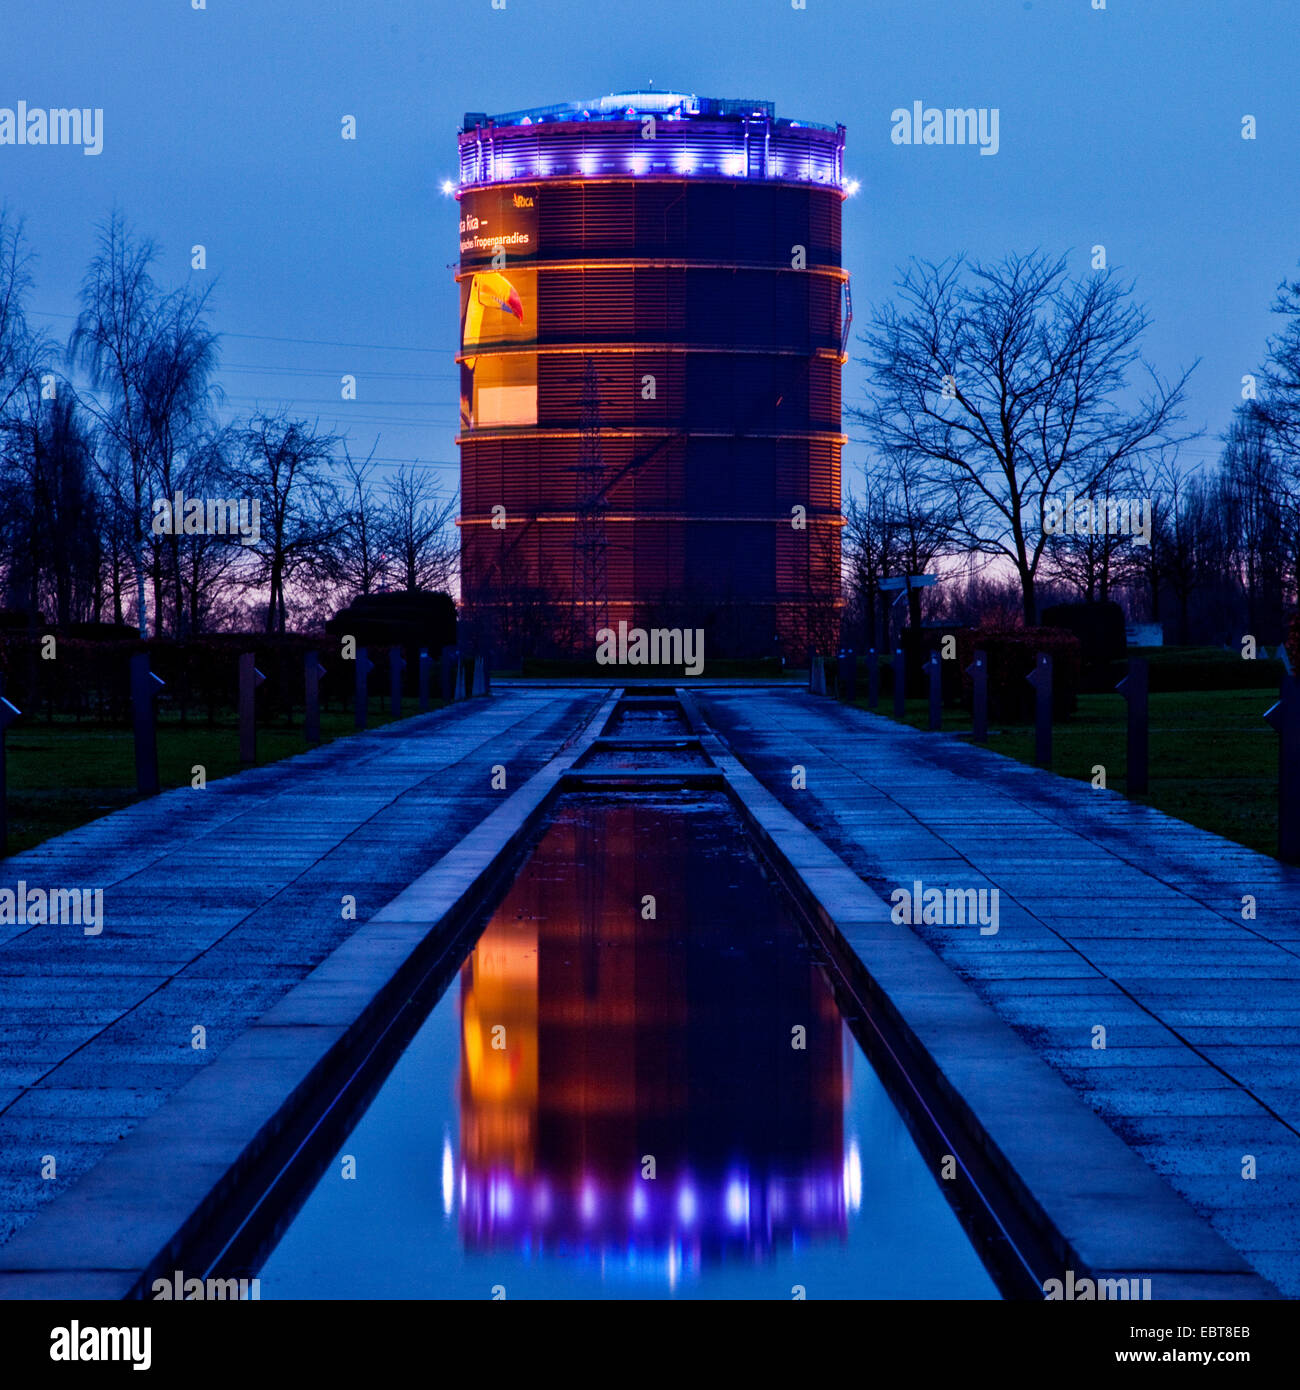 illuminated gasometer, view from Olga park, Germany, North Rhine-Westphalia, Ruhr Area, Oberhausen Stock Photo